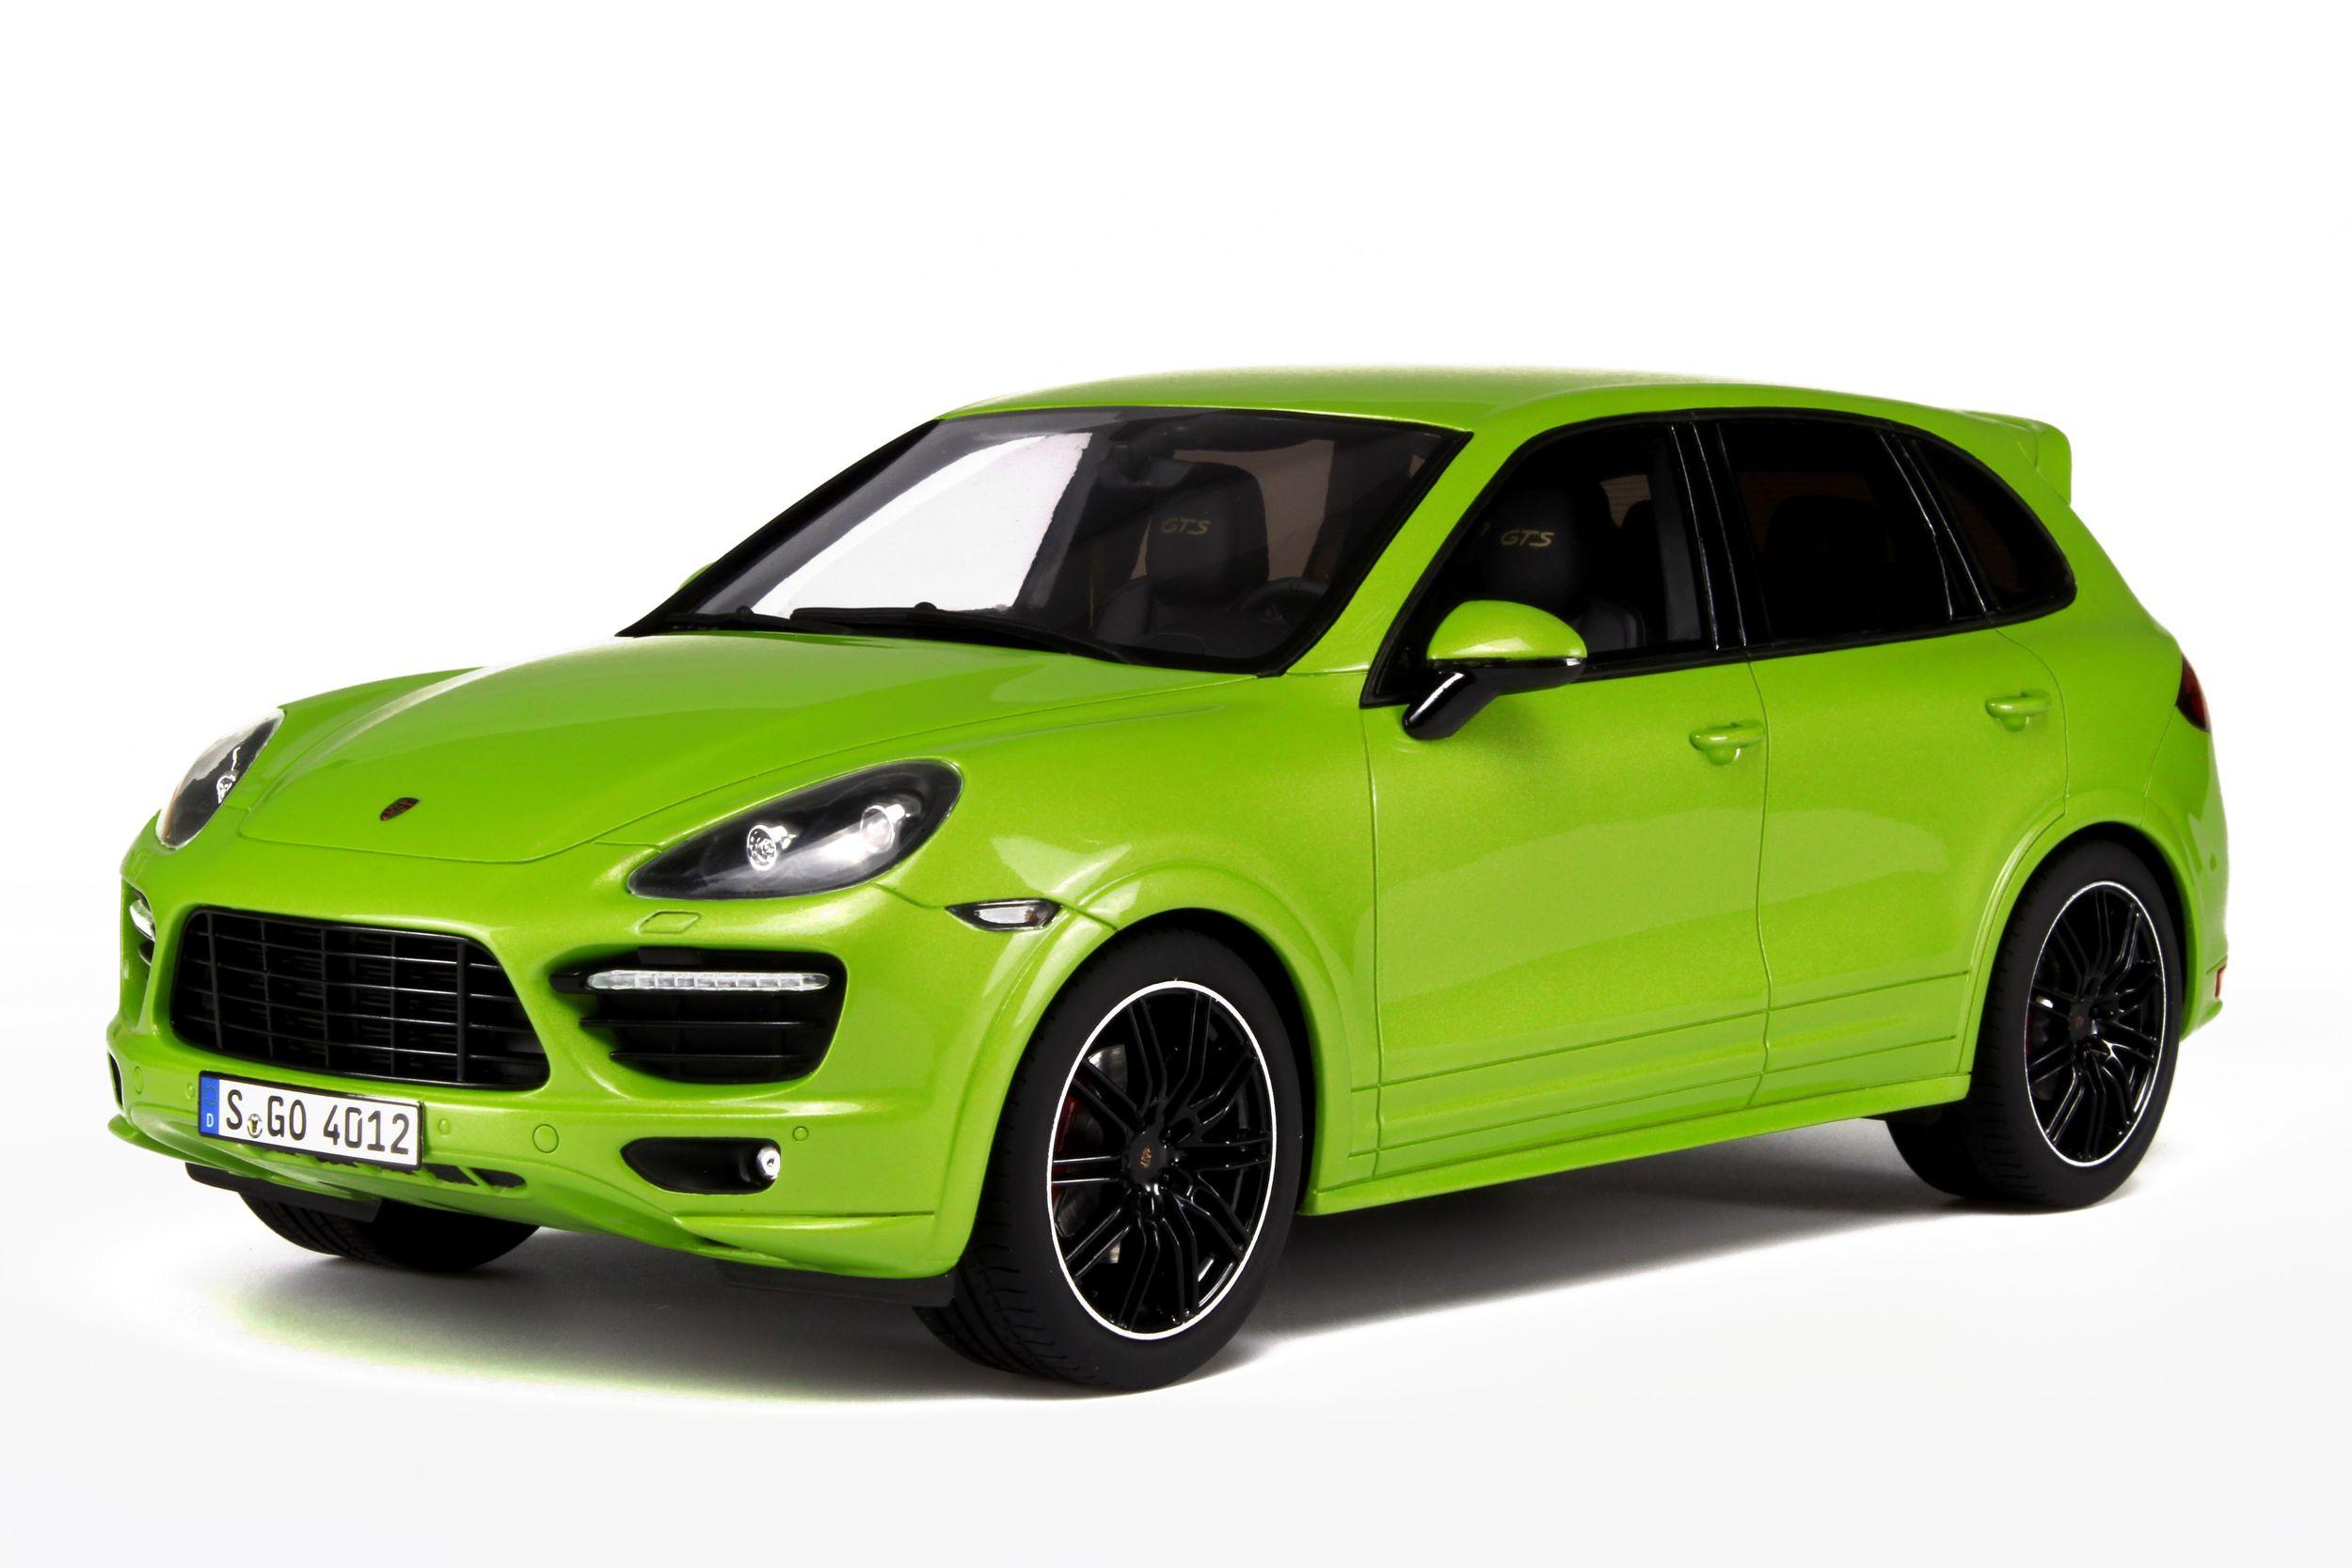 Porsche Cayenne Gts Model Car Collection Gt Spirit